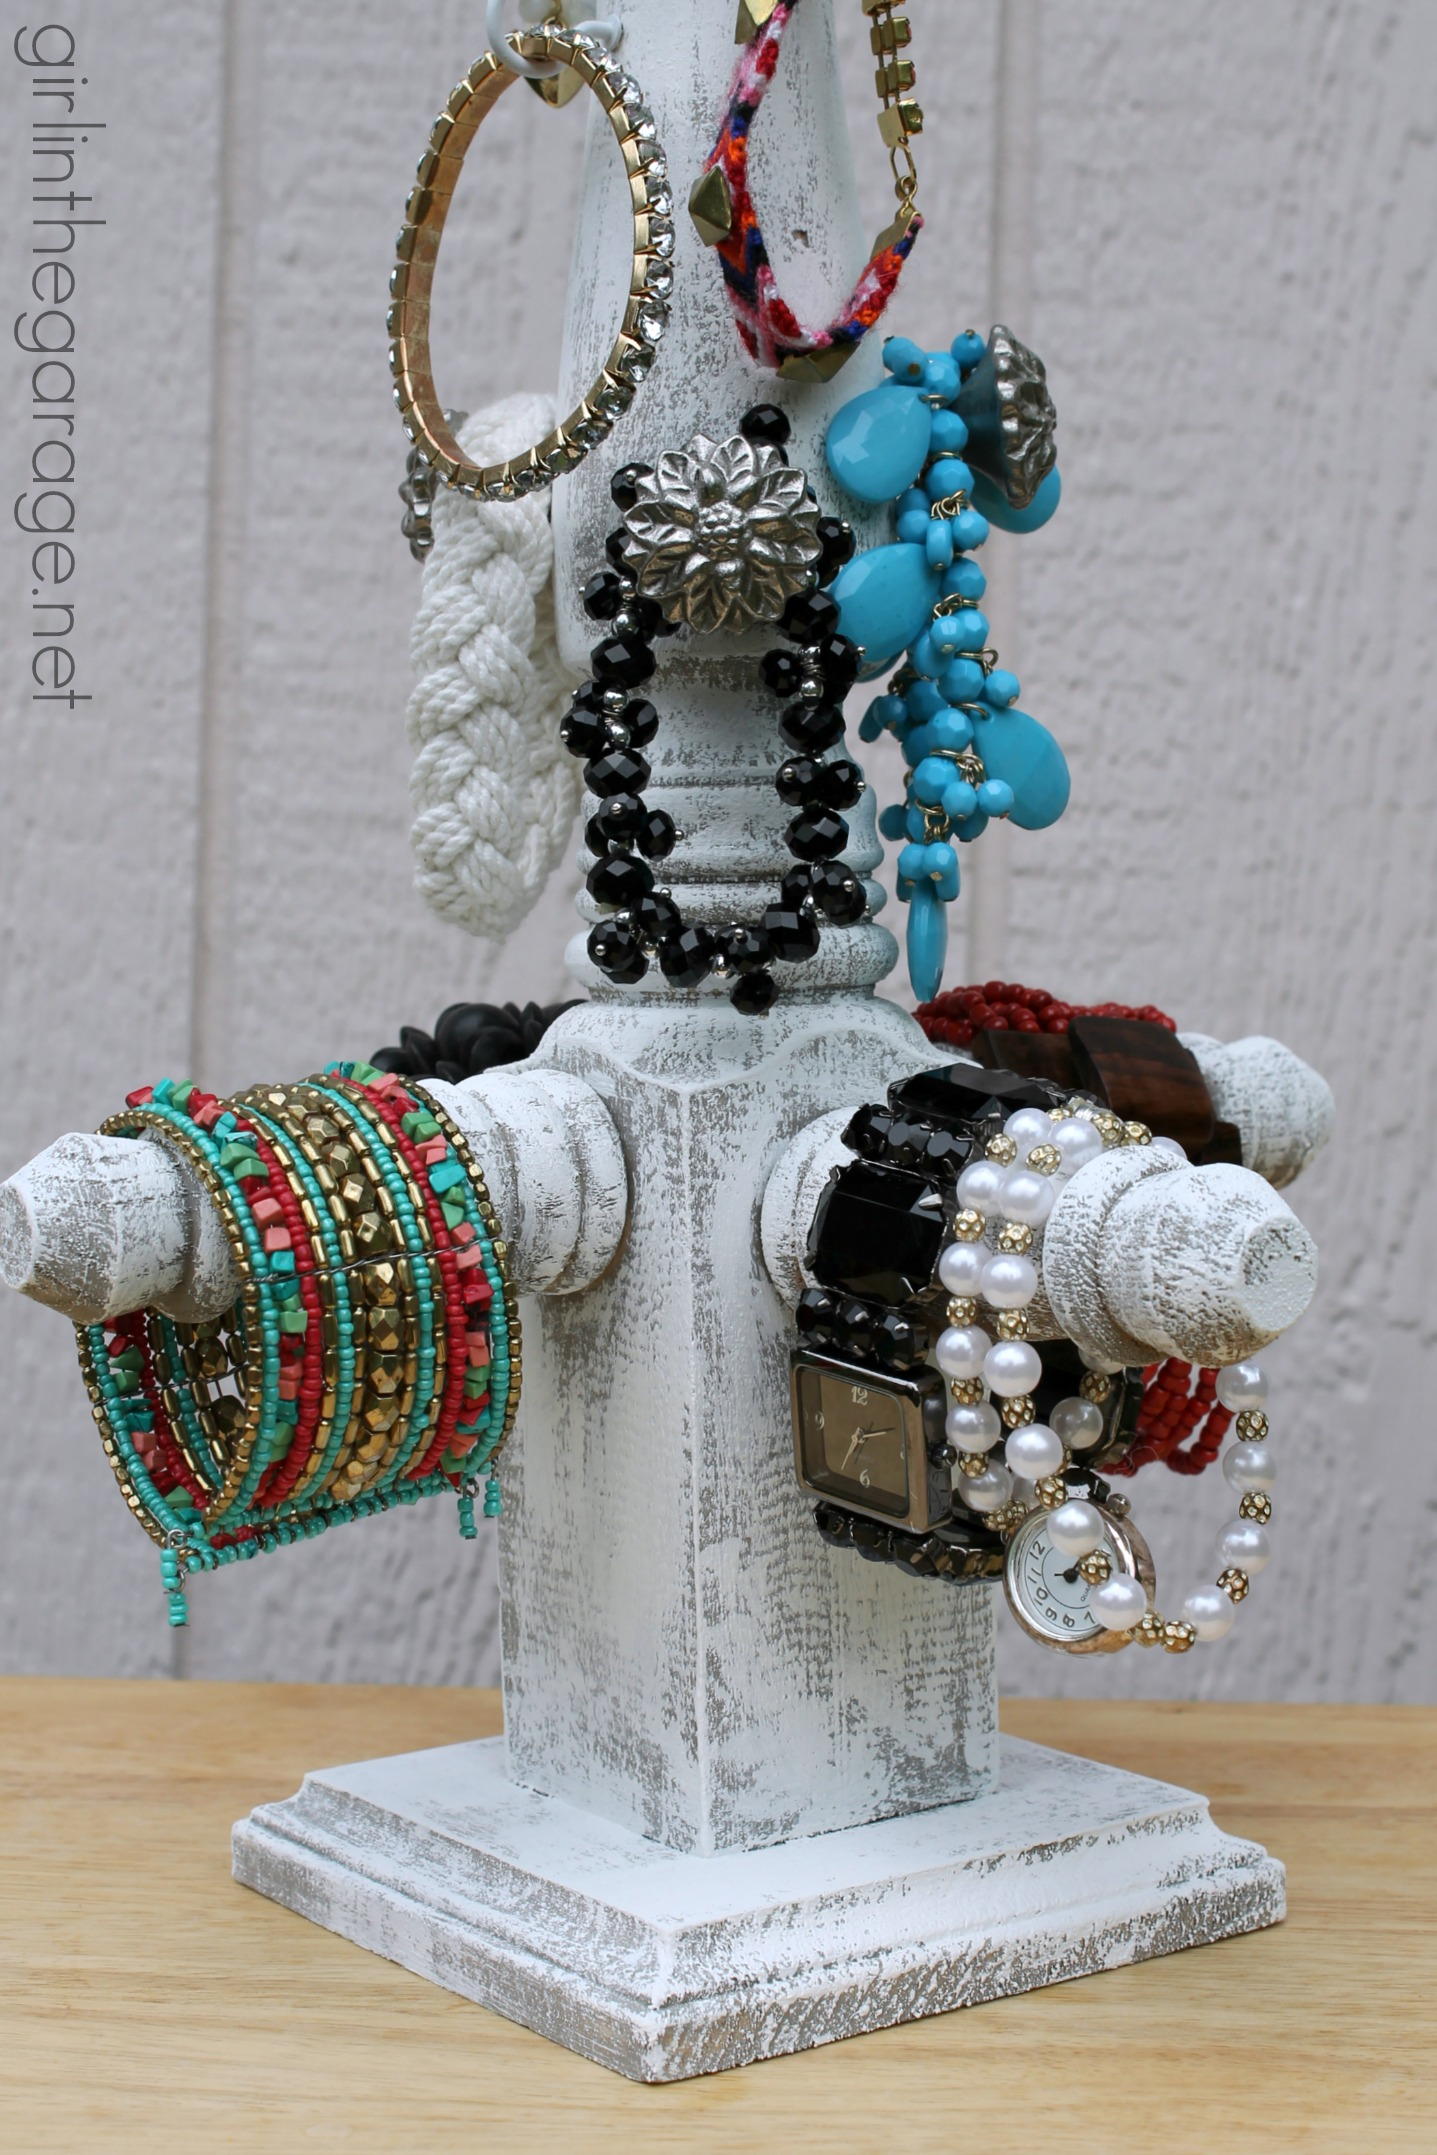 DIY Bracelet Stand - Lowe's DIY Days | Girl in the Garage®